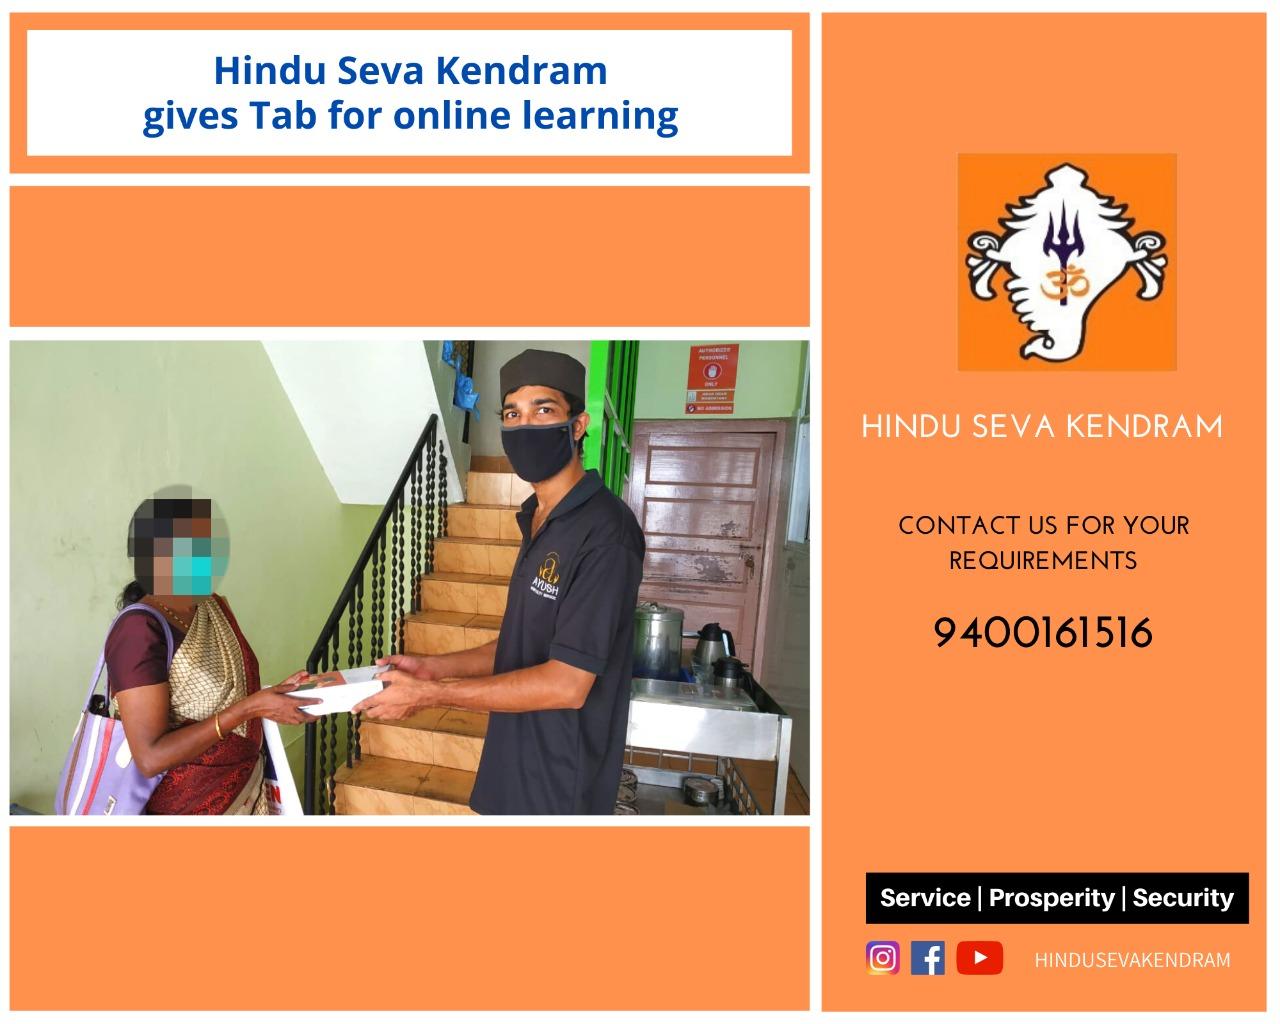 Hindu Seva Kendram gives Tab for Online Learning